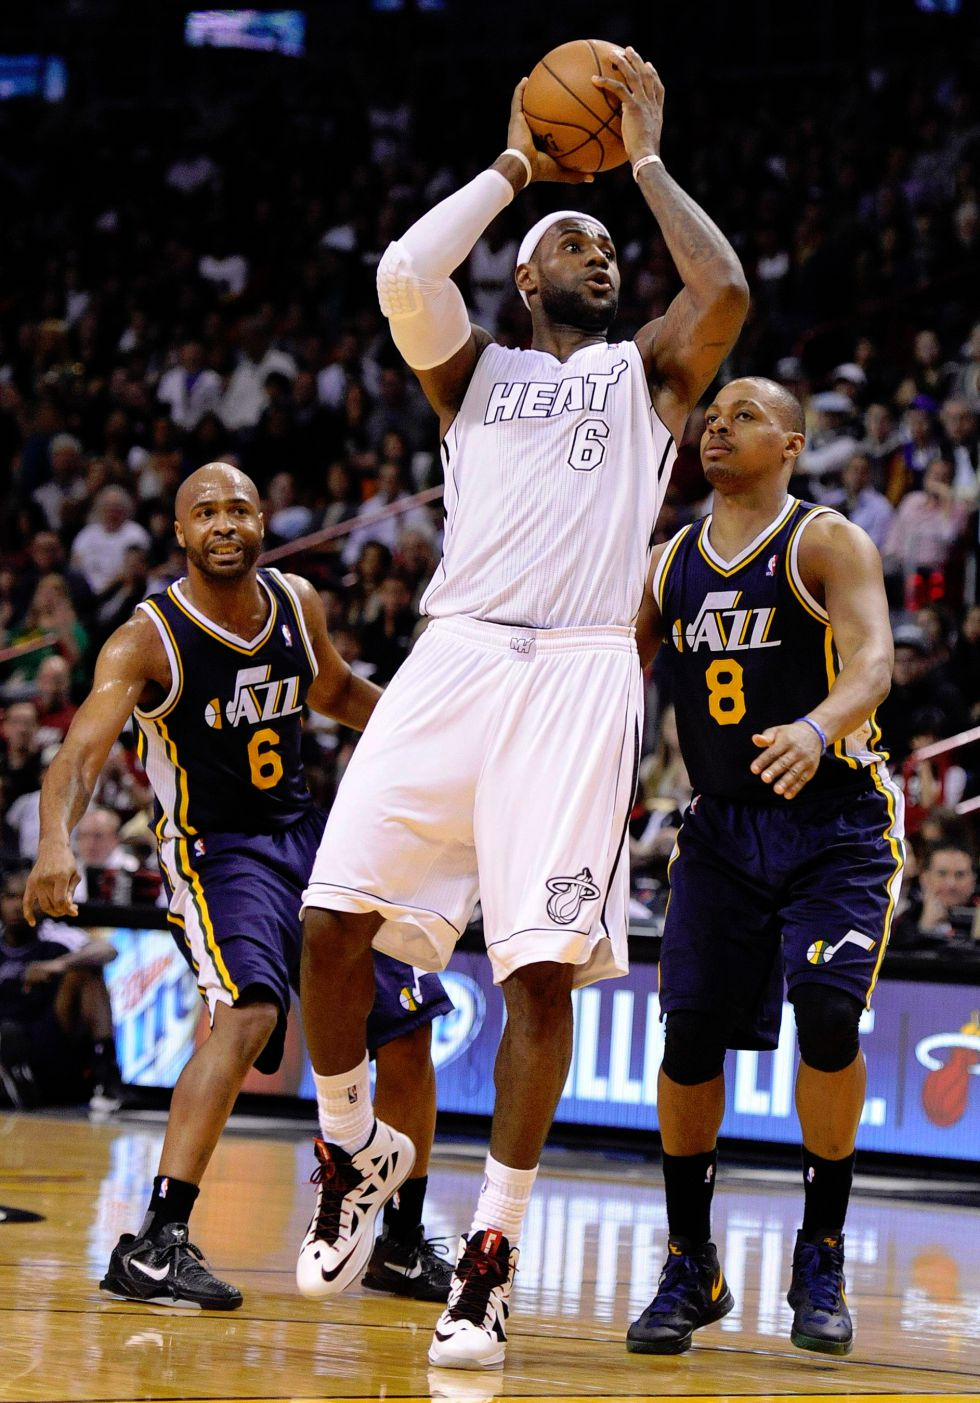 LeBron James logra igualar una marca histórica en la NBA